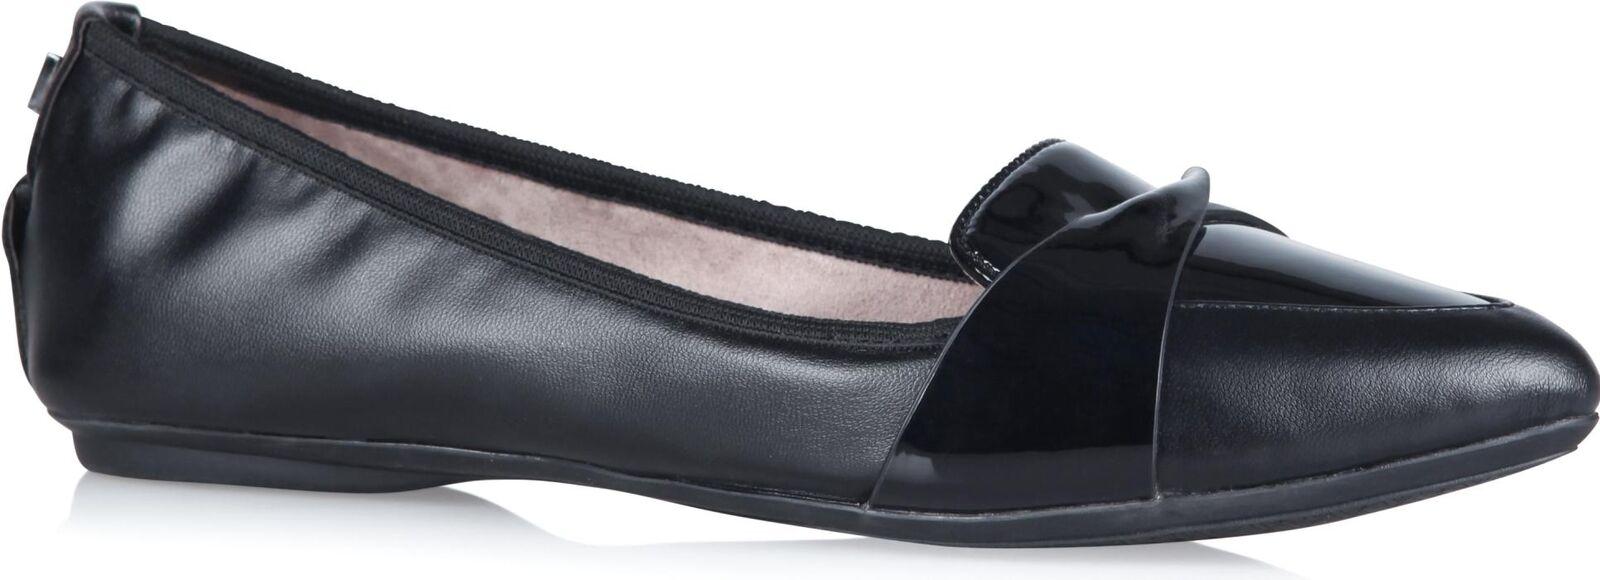 Butterfly Twists Rebecca Femmes Femmes Pointu Ballerine Replier Plat Chaussures Noir